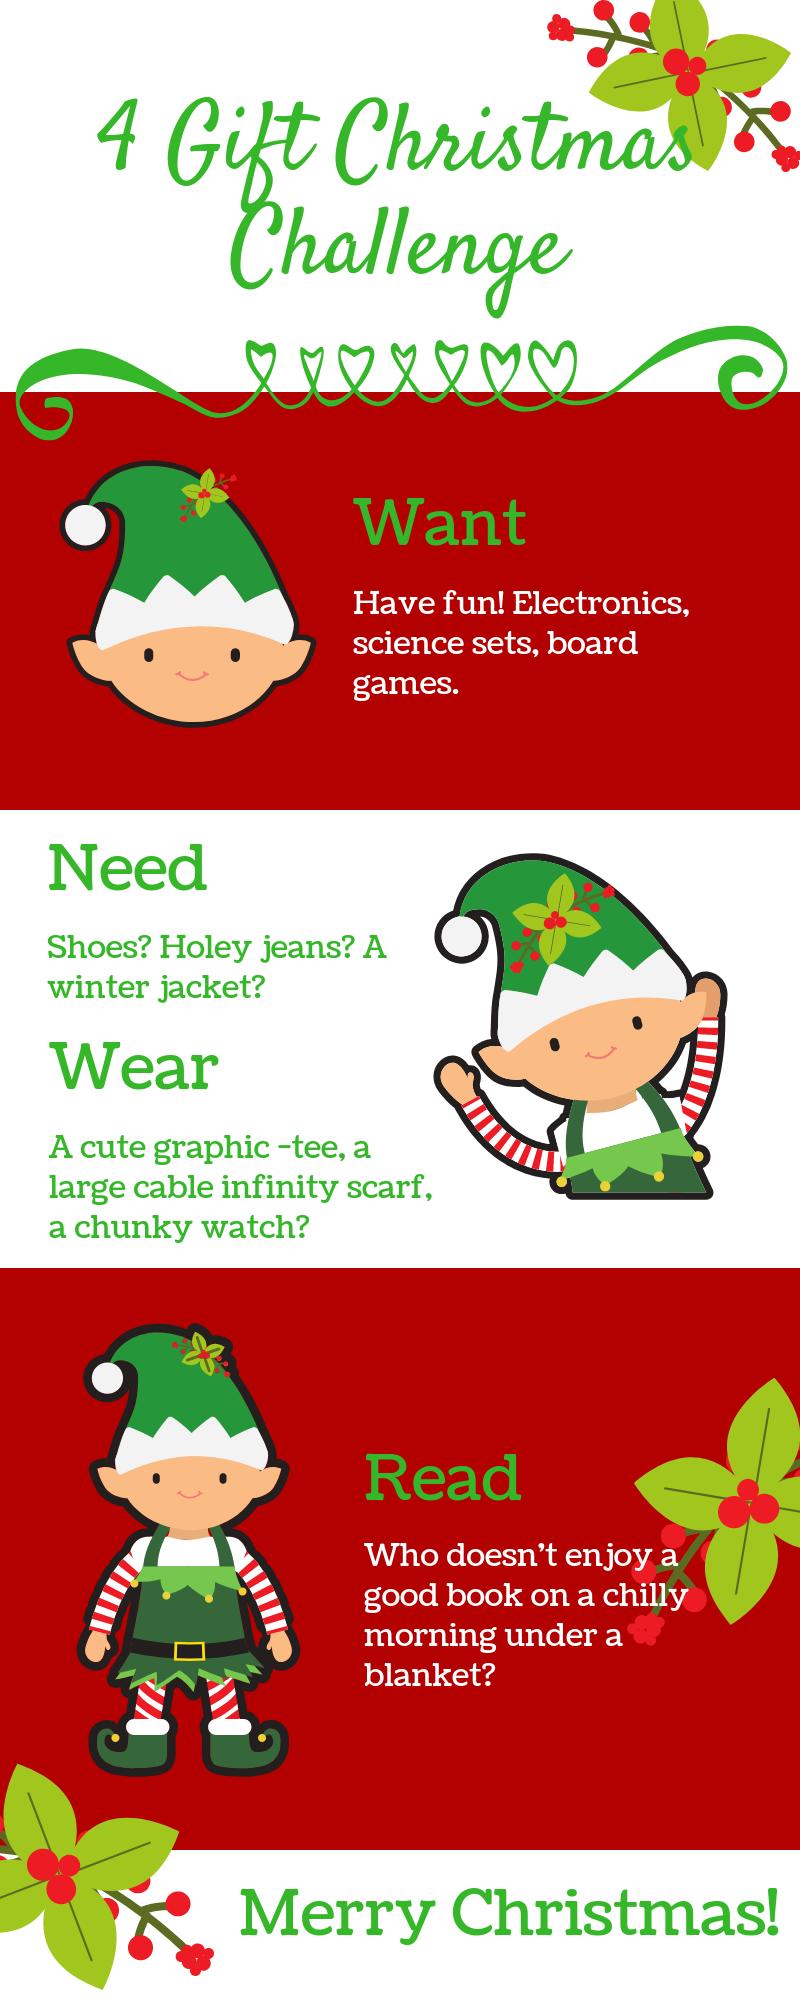 4 Gift Christmas Challenge